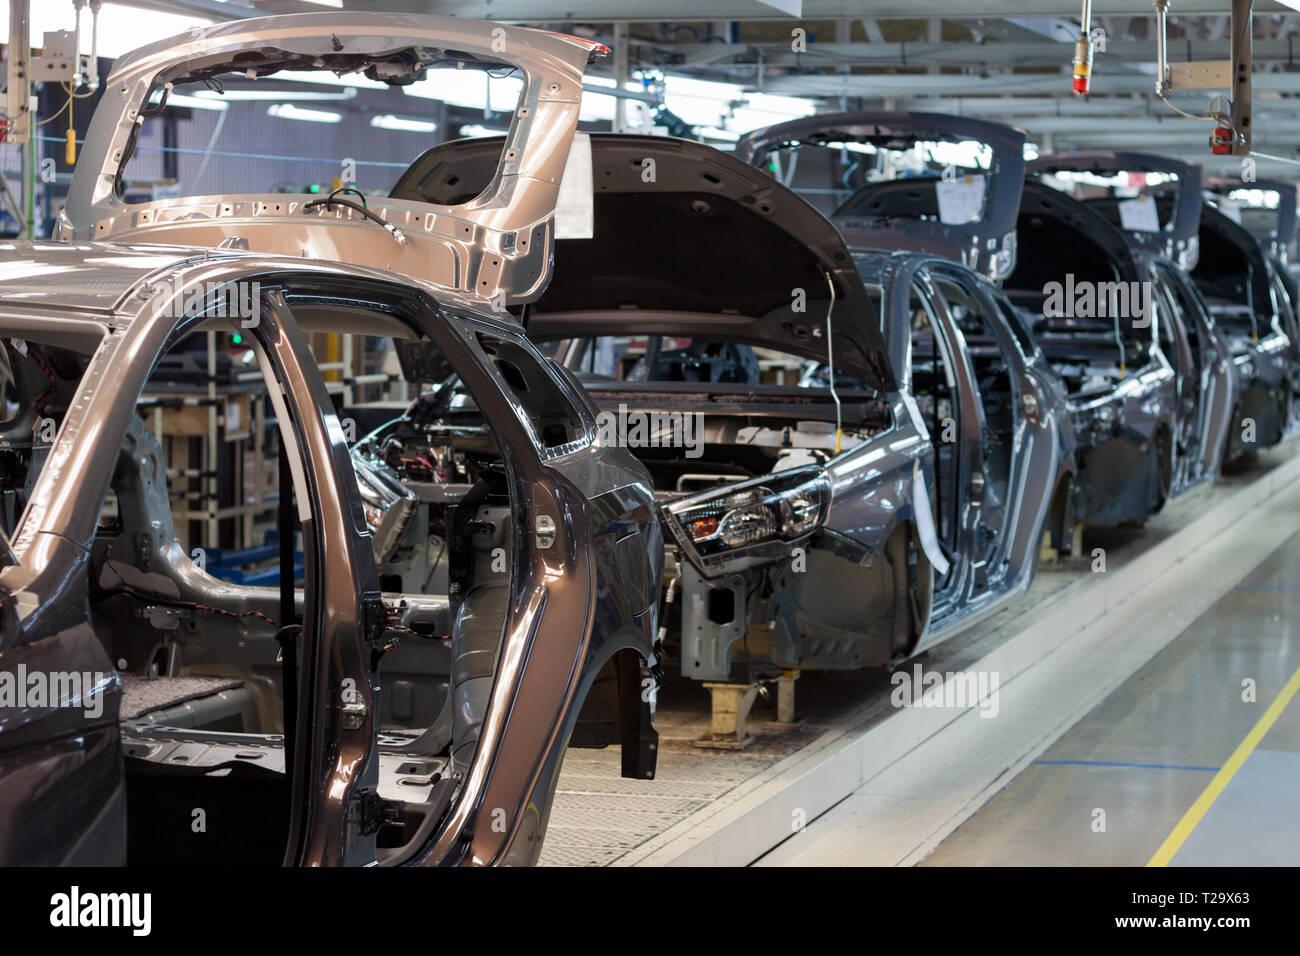 Russia, Izhevsk - December 15, 2018: LADA Automobile Plant Izhevsk, part of the AVTOVAZ Group. Frame construction of a new car on the conveyor line. A - Stock Image